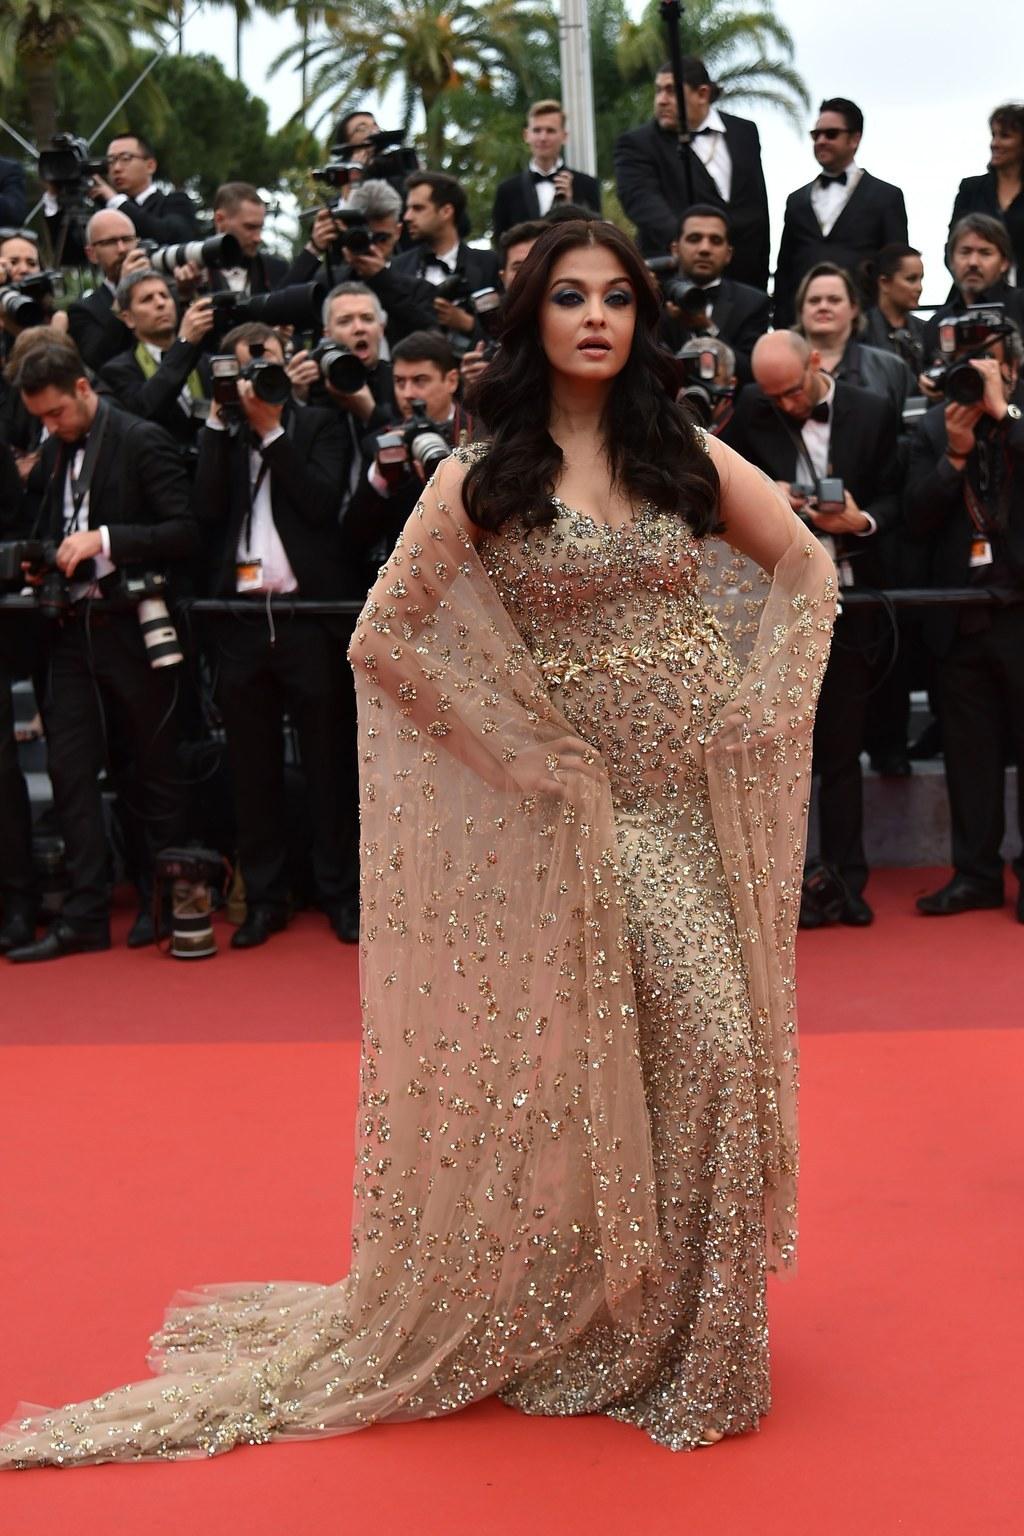 Aishwarya Rai Bachchan Look Savagely Beautiful At The 69th Cannes Film Festival